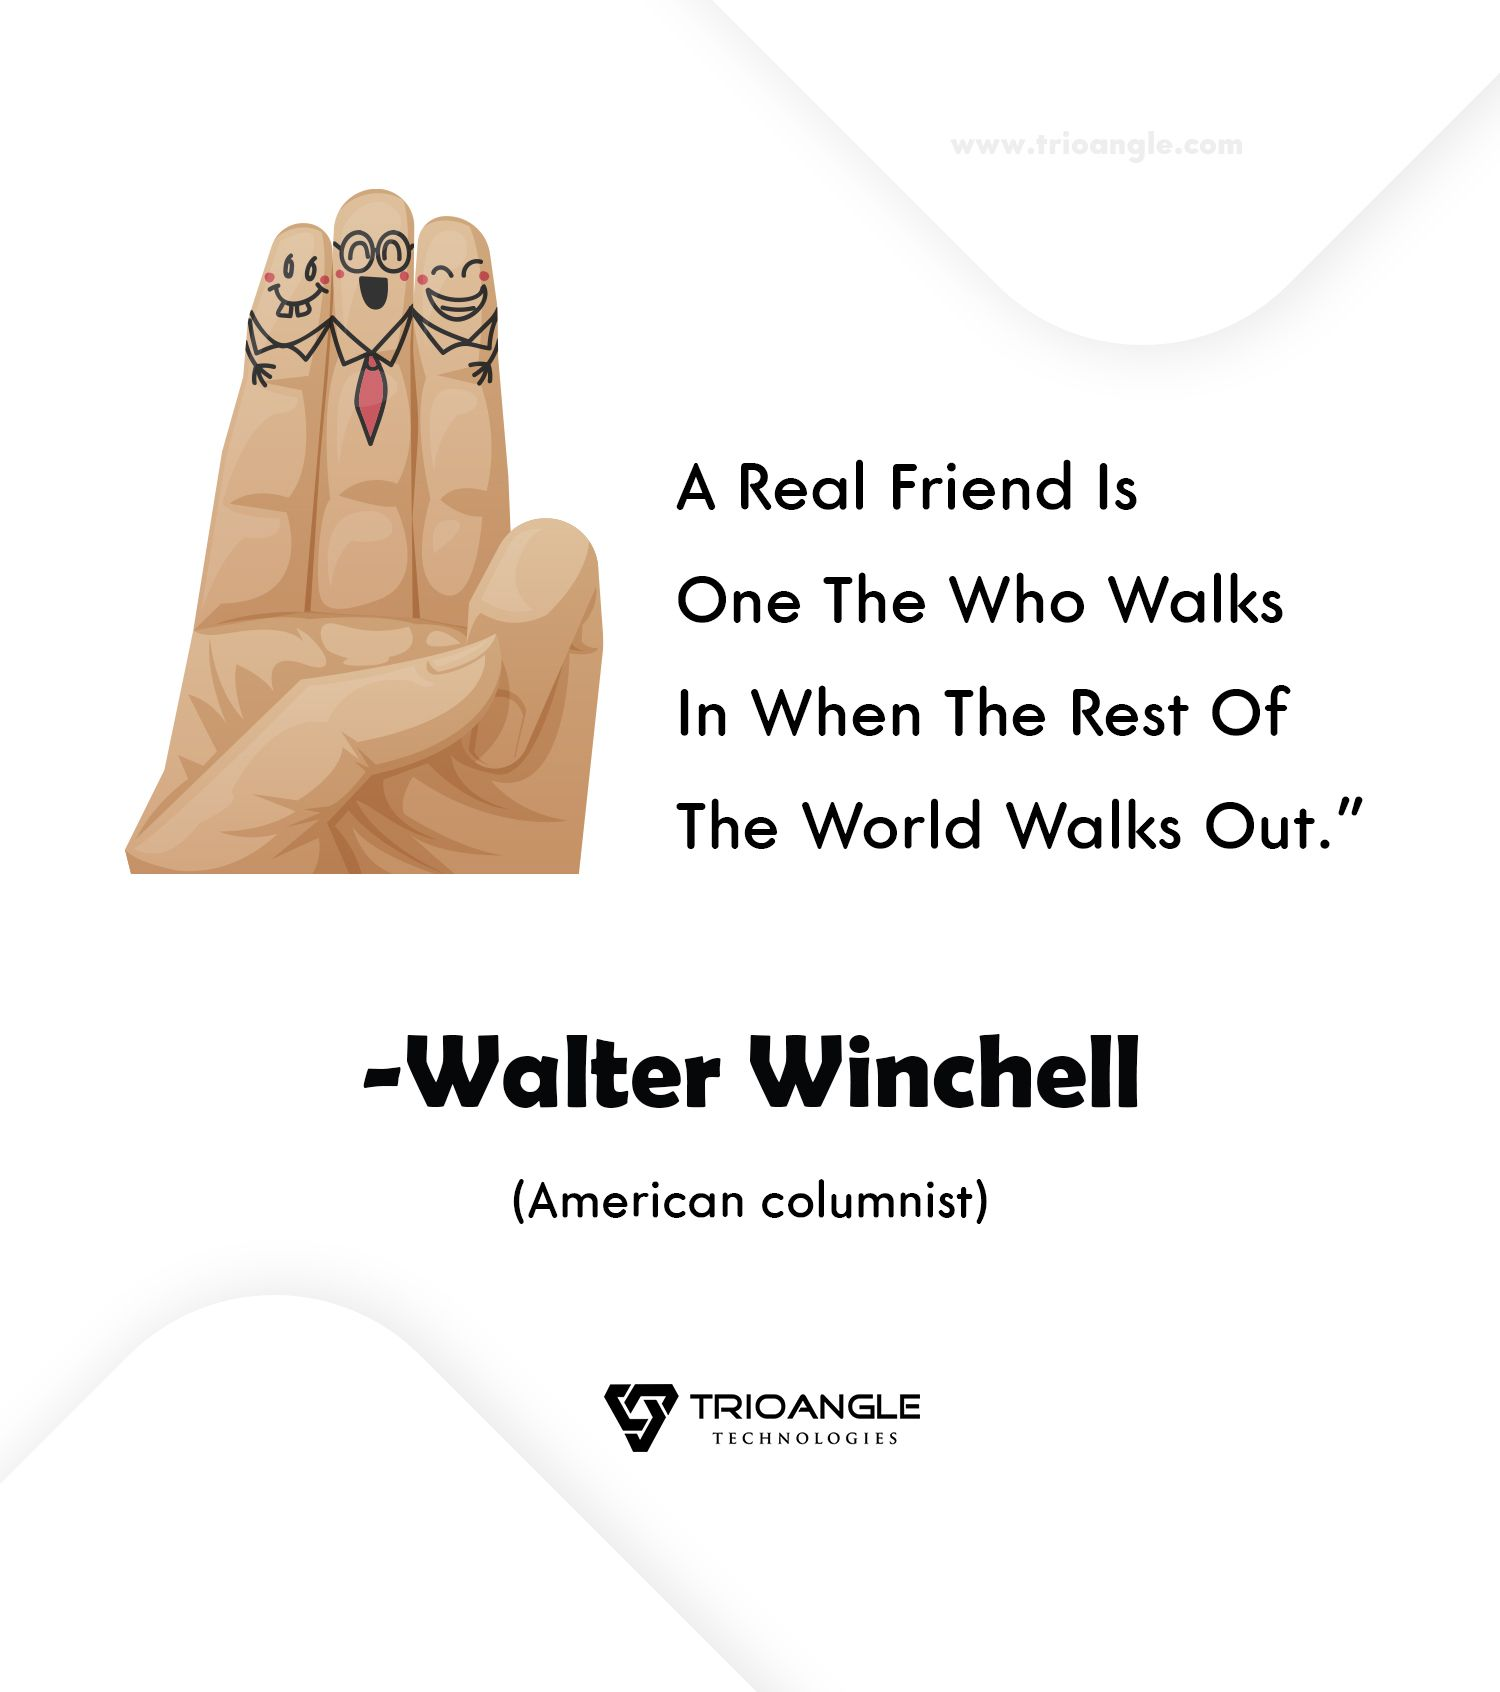 Best Letgo Clone Script Friendship quotes, Wise quotes